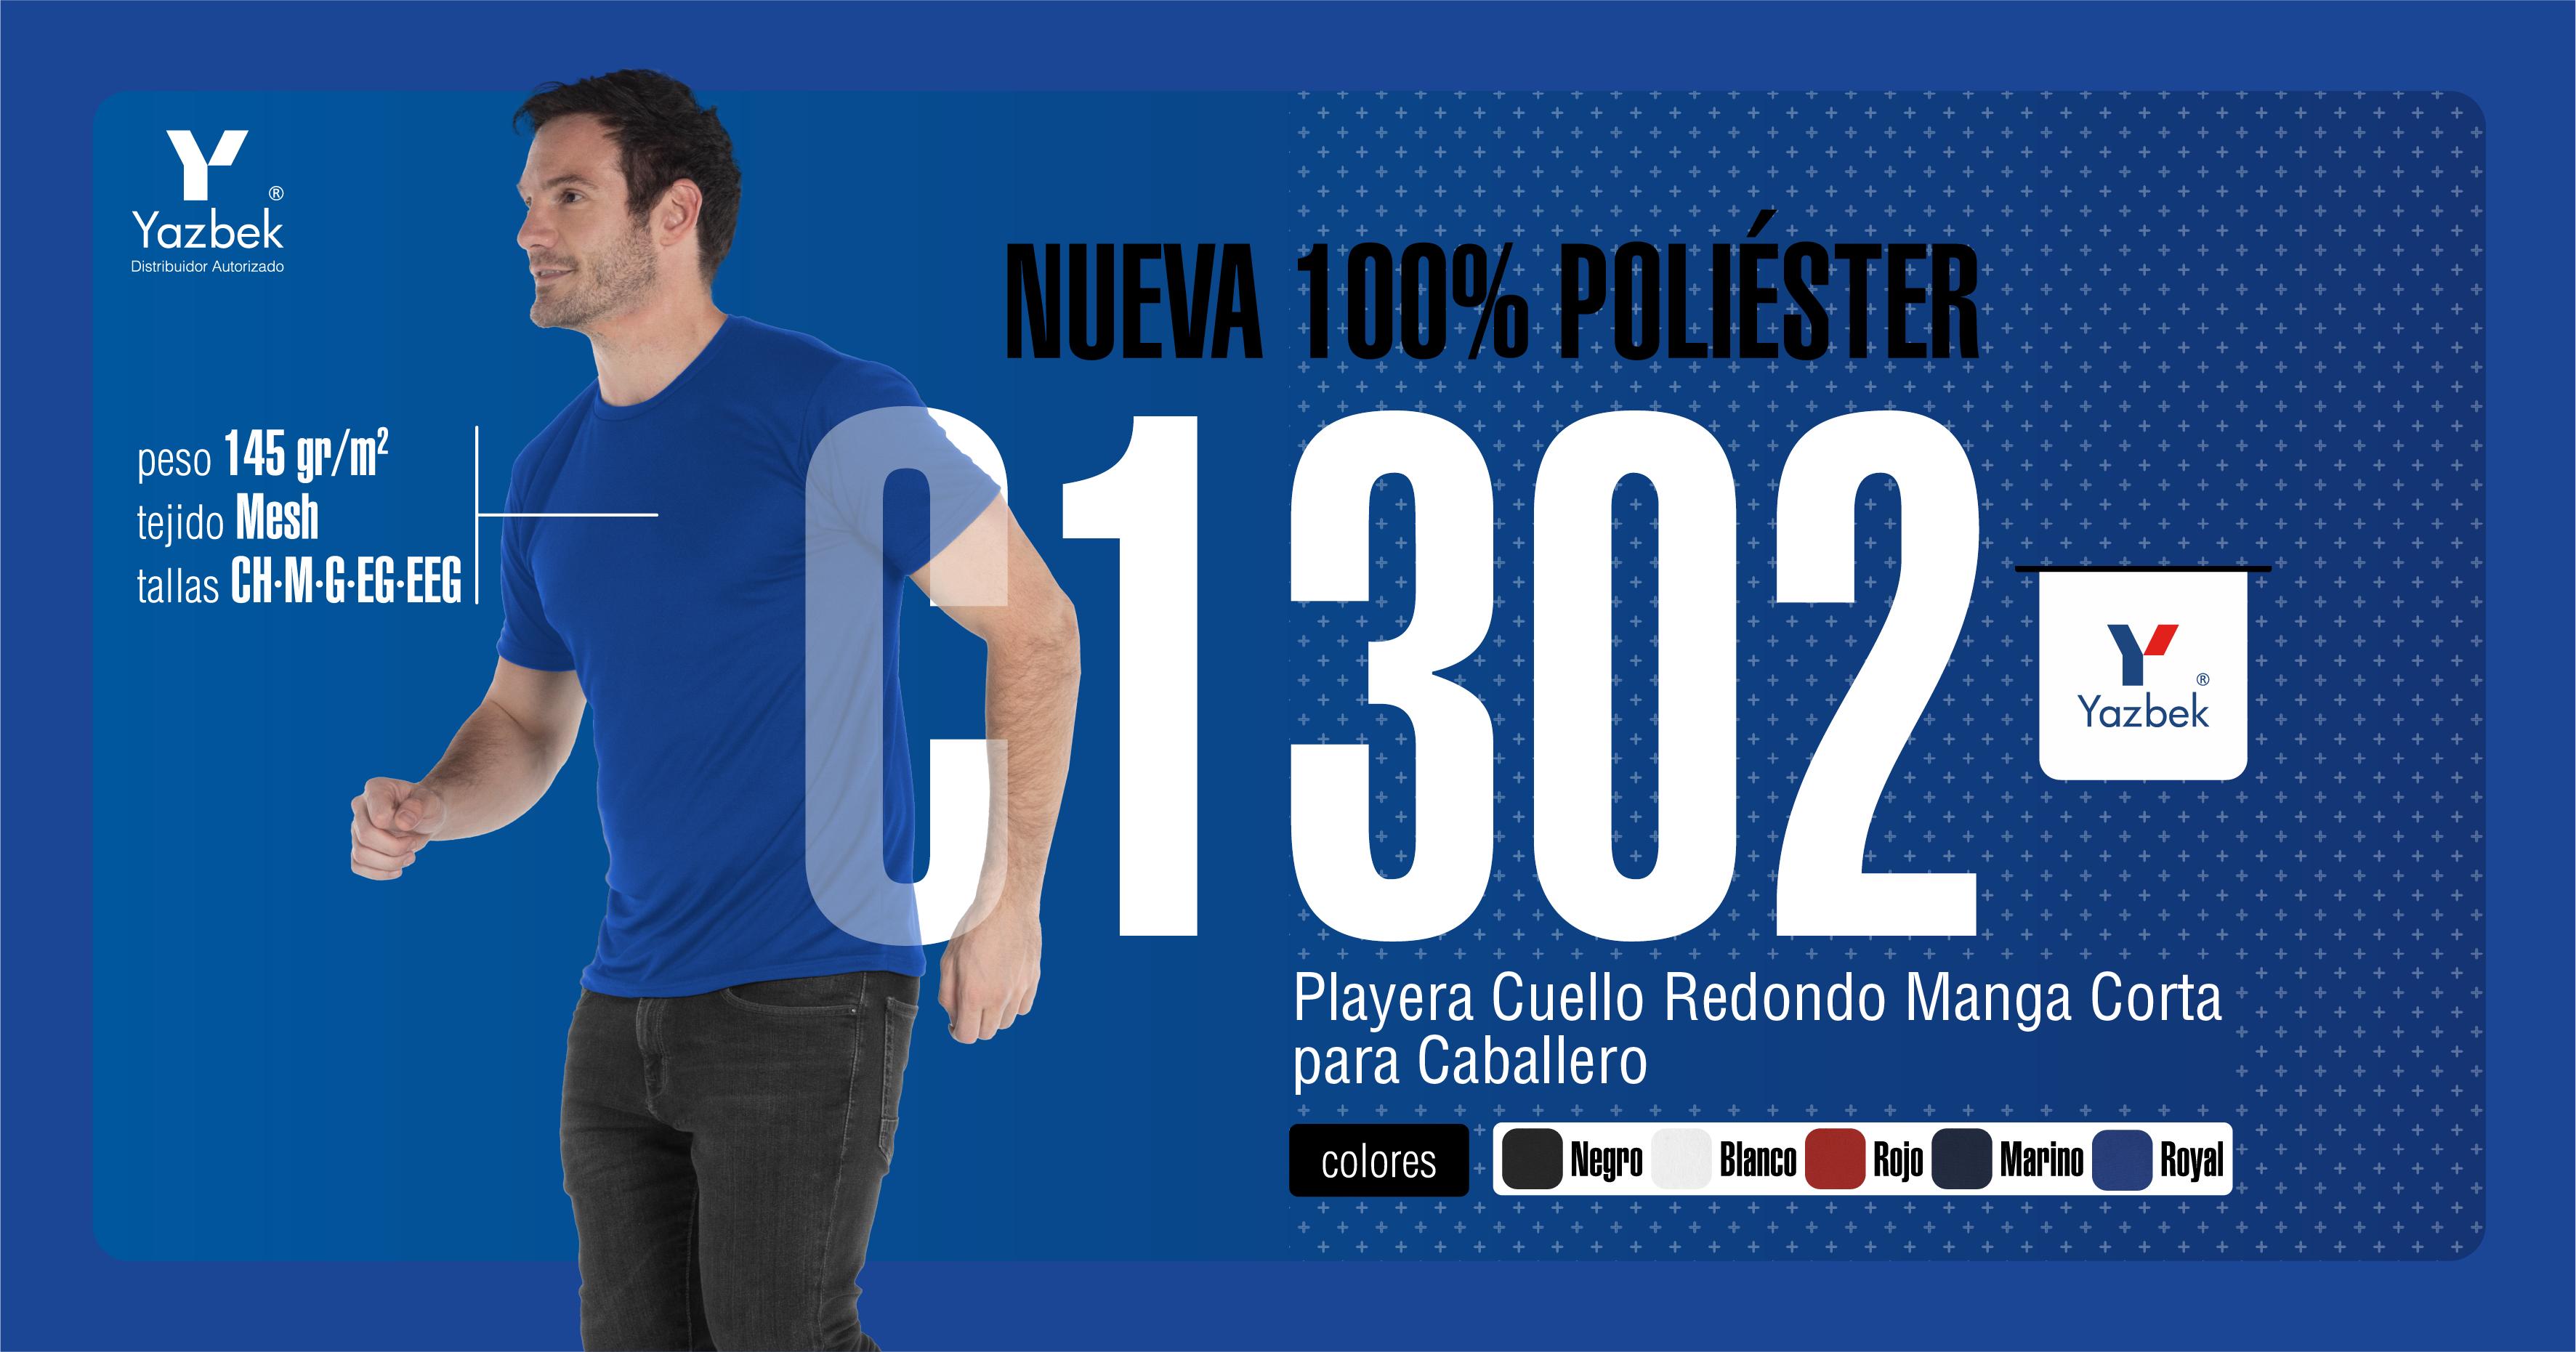 NUEVA PLAYERA DEPORTIVA DRY FIT. 100% POLIESTER. MESH CABALLERO.